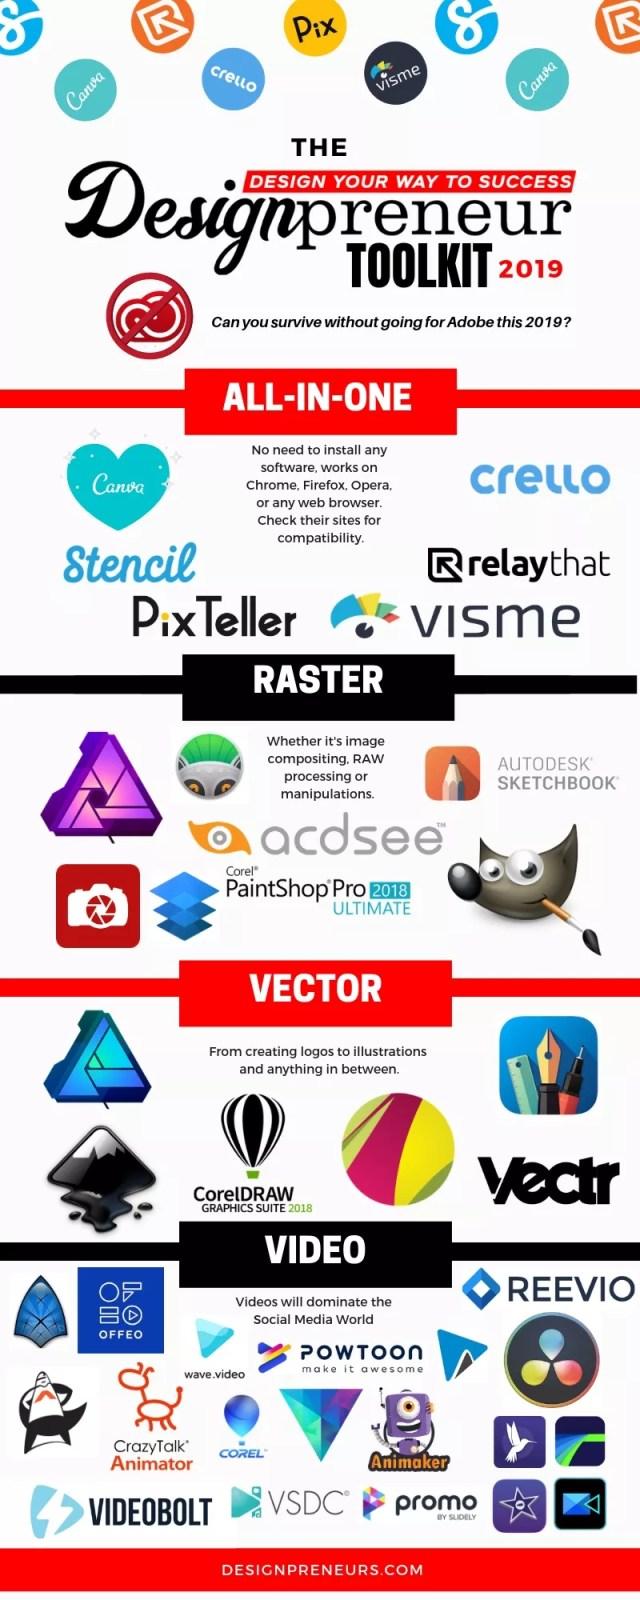 designpreneurs toolkit 2019 by mrdzyn studio